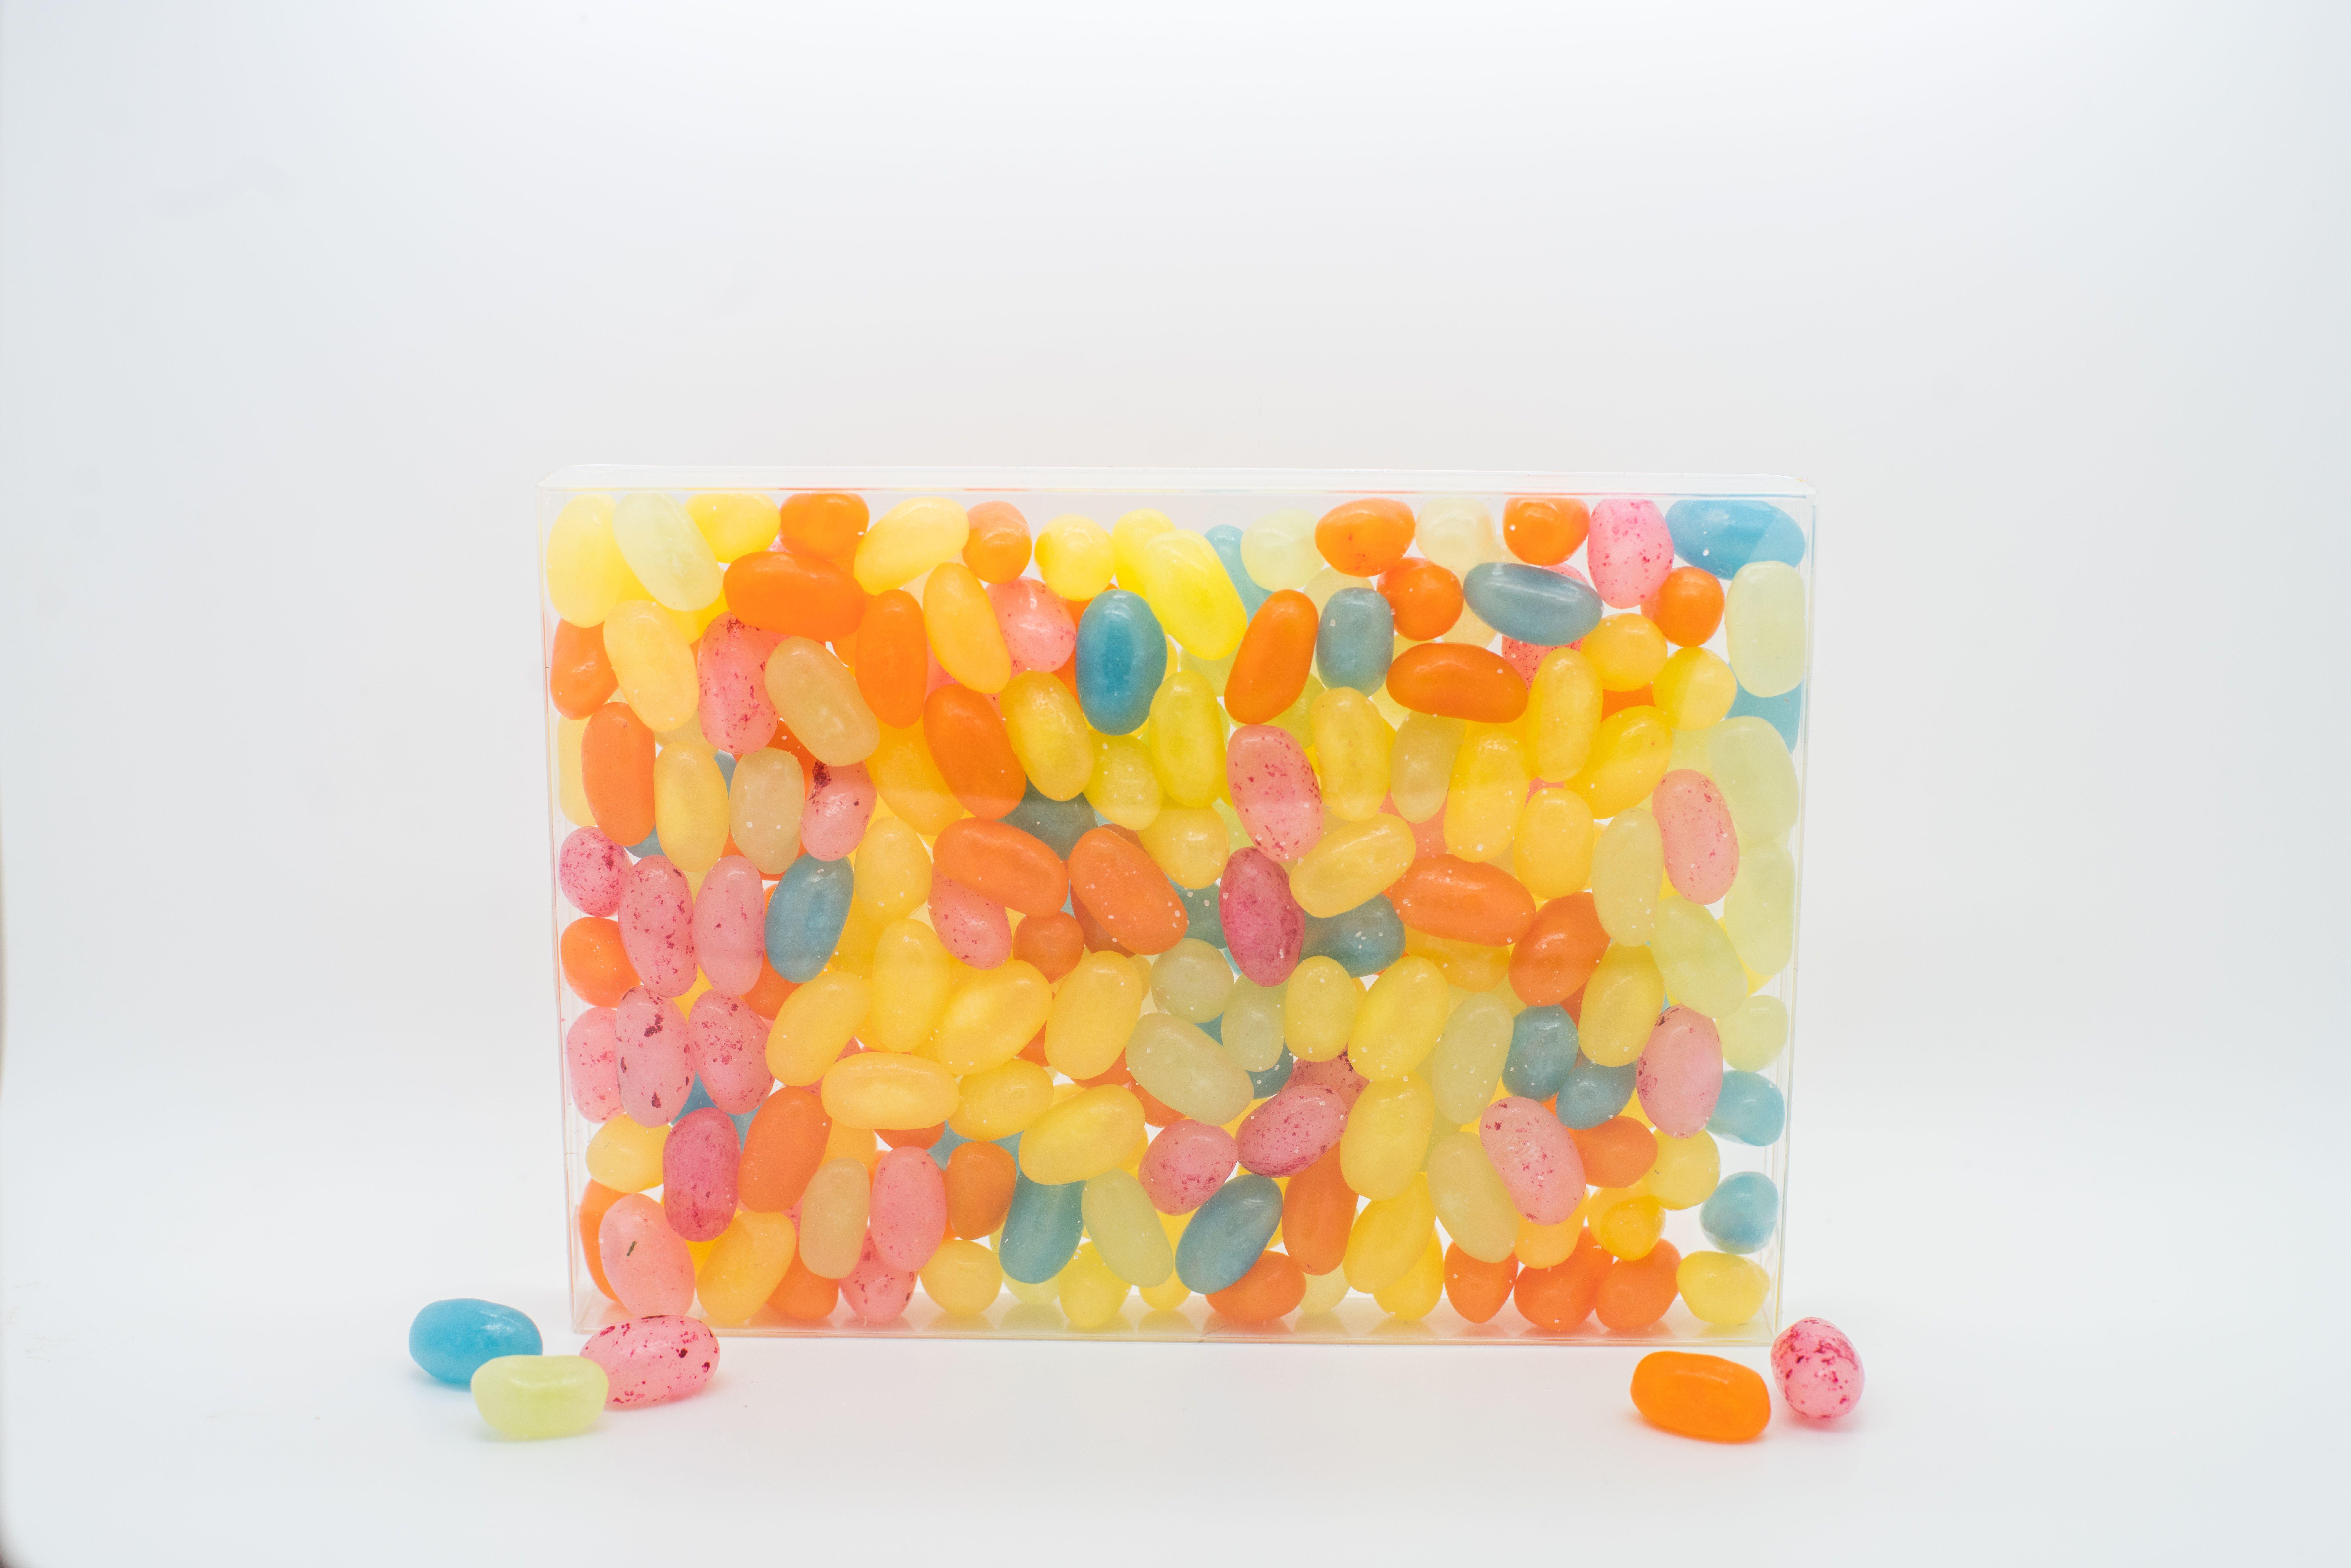 Jellybeans By Veel Liefs Voor Jou Jellybeans